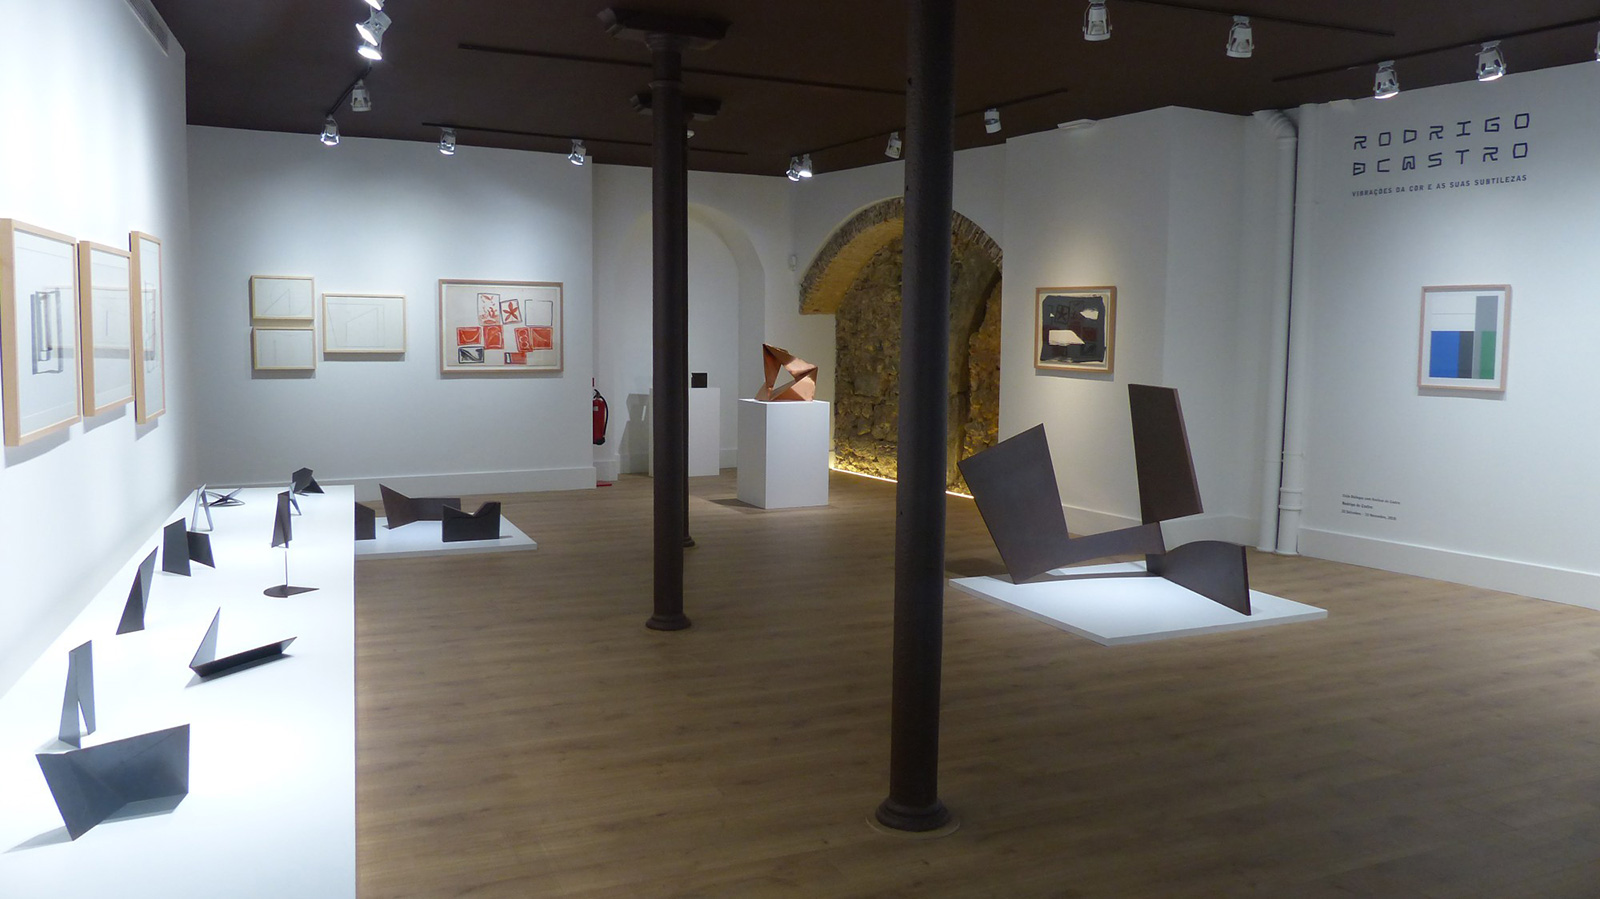 Galeria Primner - Lisbon art gallery